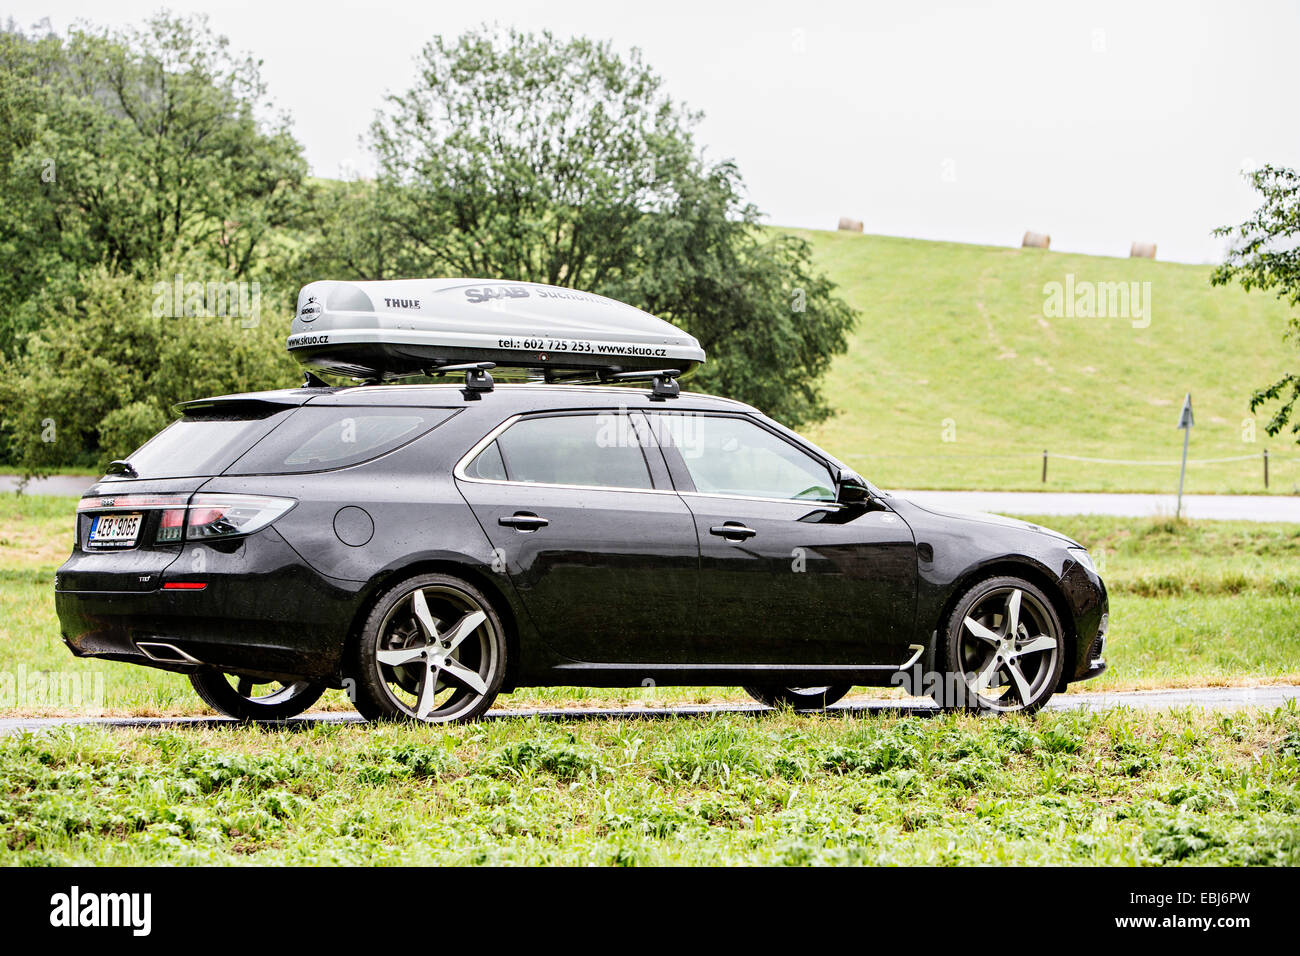 New Saab 9-5 SportCombi Aero, Saab Sport Combi 9-5 Aero 2.0 TTiD ...